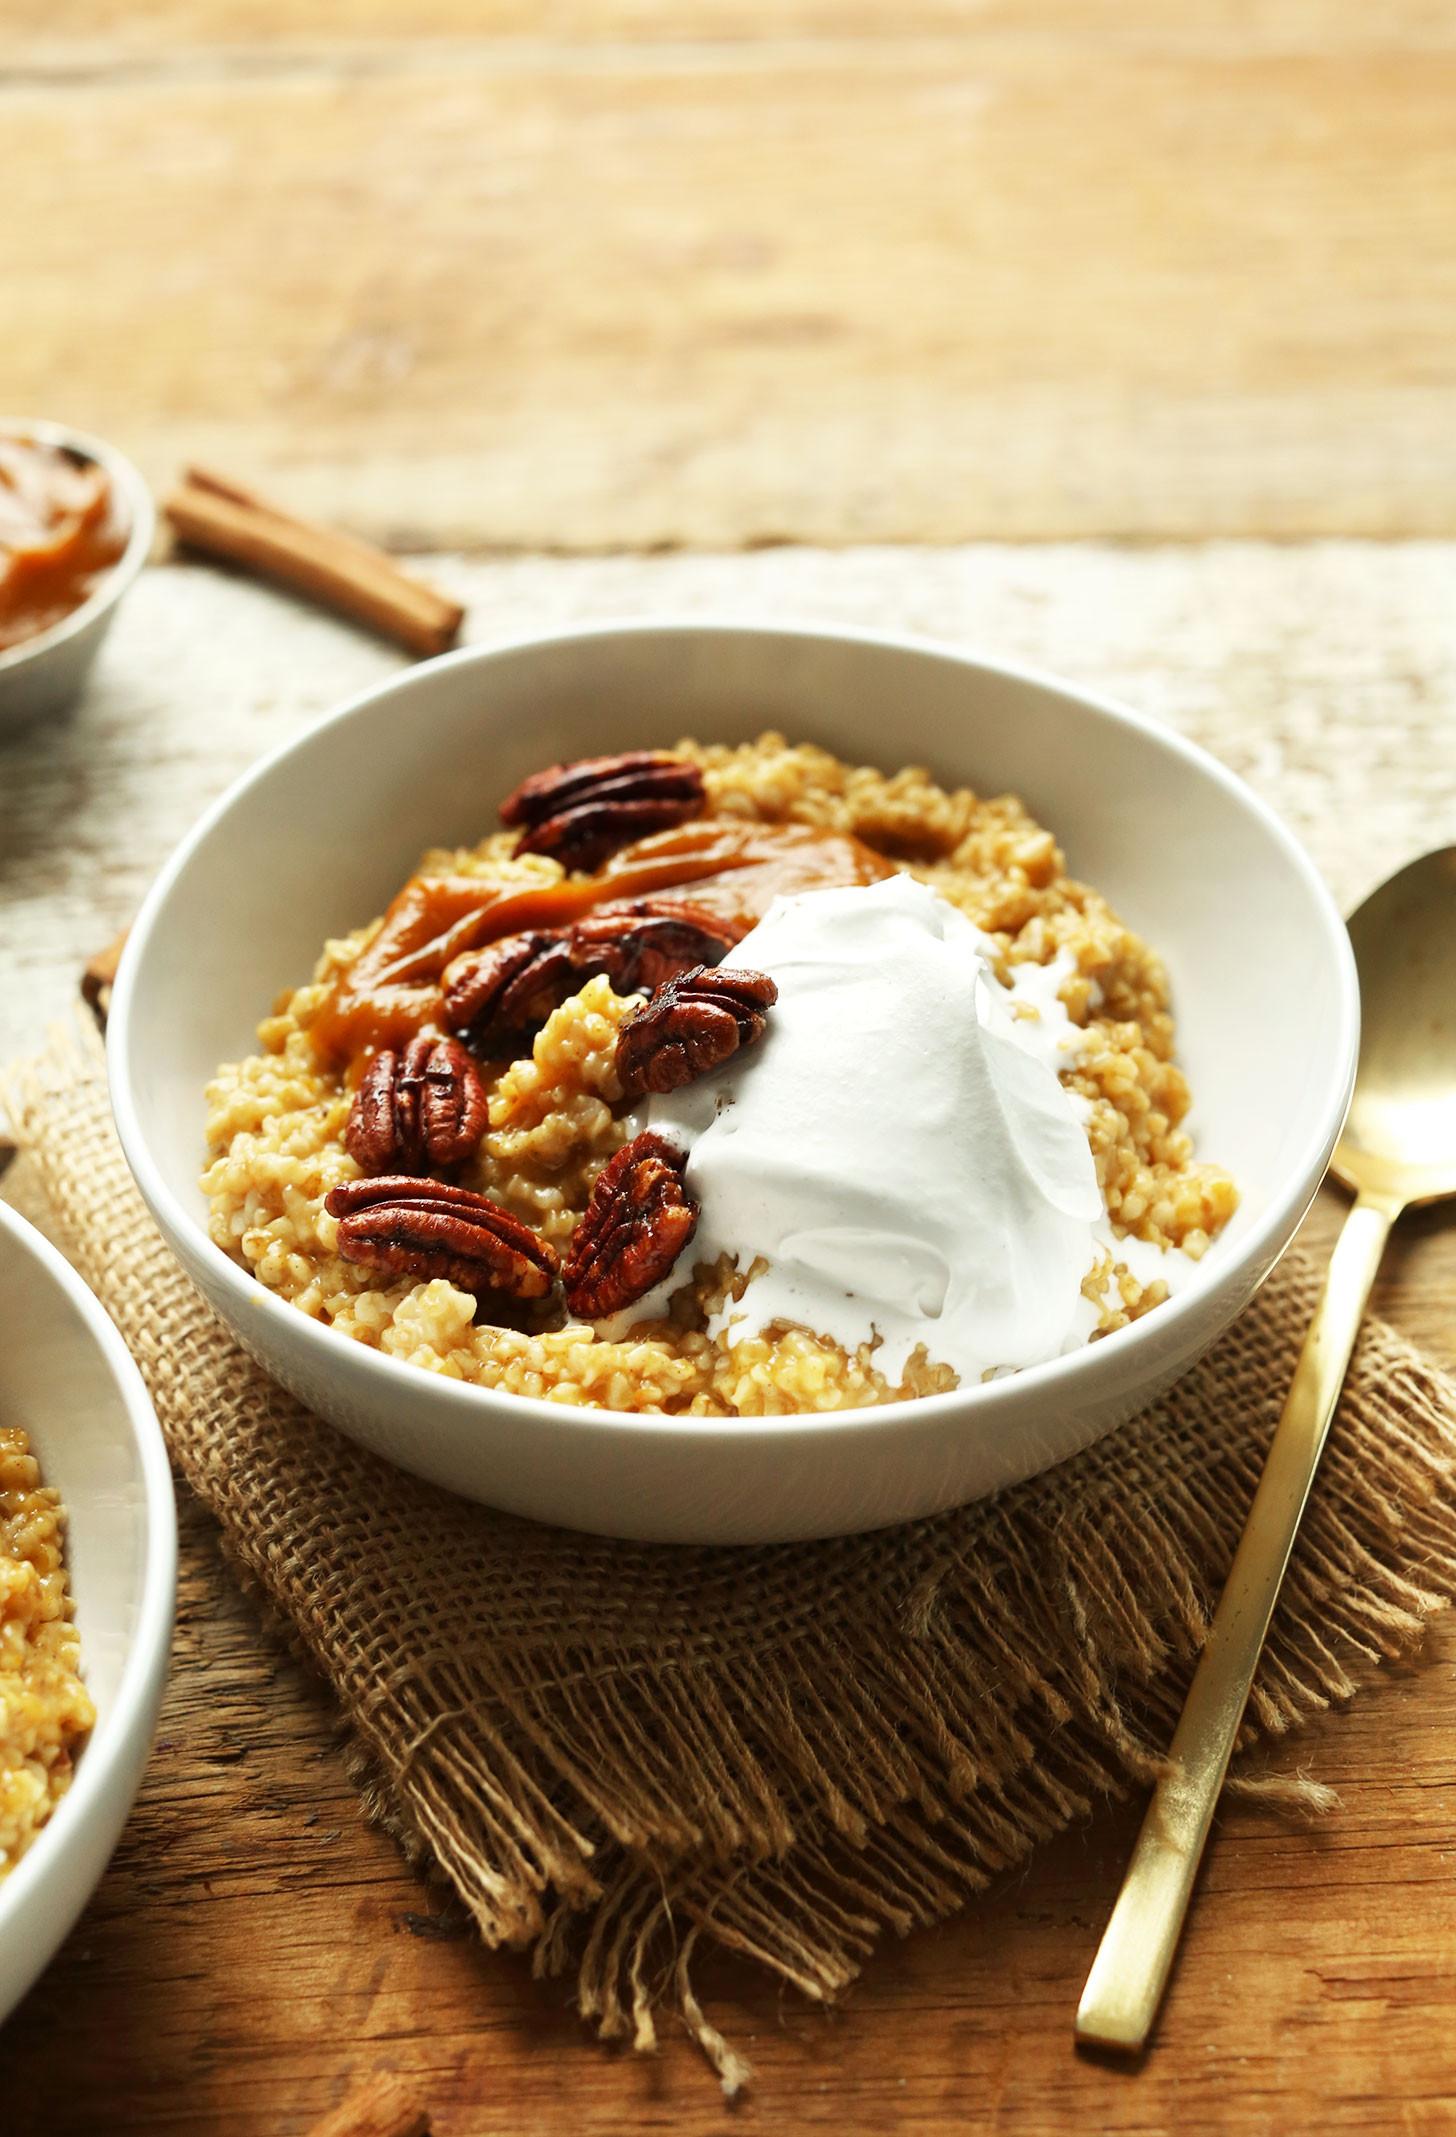 Healthy Pumpkin Breakfast Recipes  30 wholesome vegan breakfasts that will keep you full